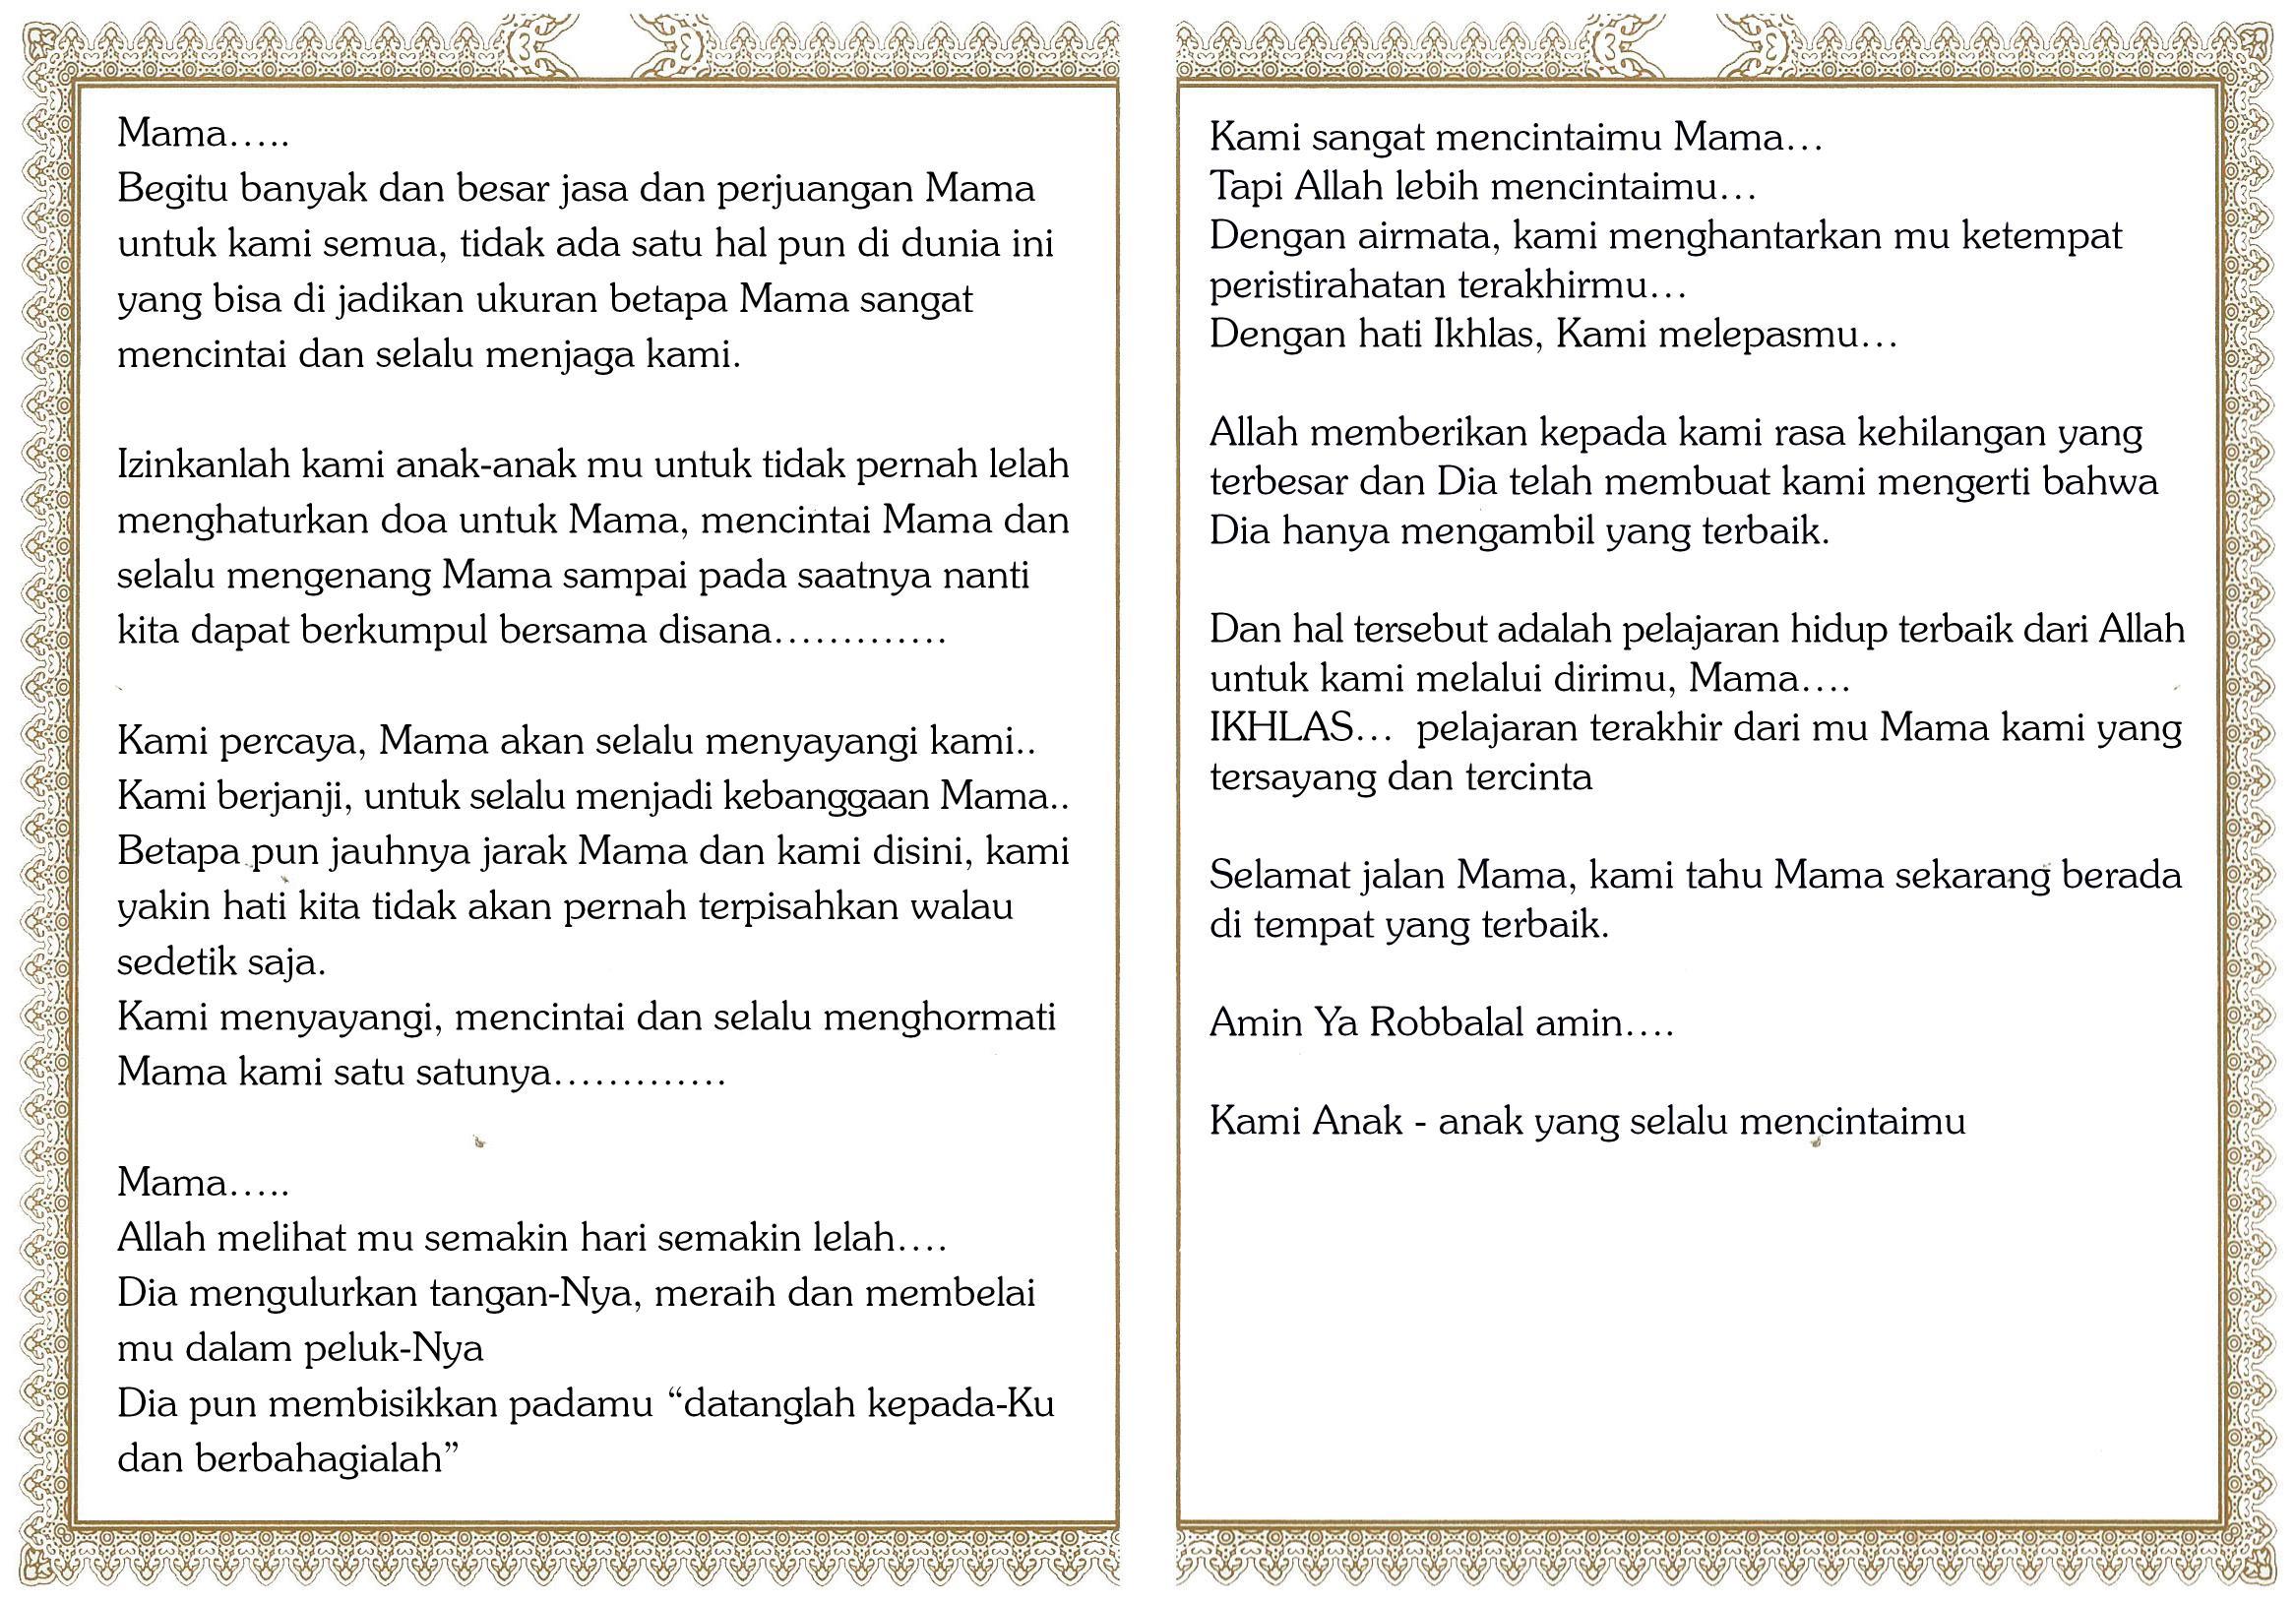 Cetak Yasin Daffa : CONTOH REDAKSI DALAM BUKU YASIN